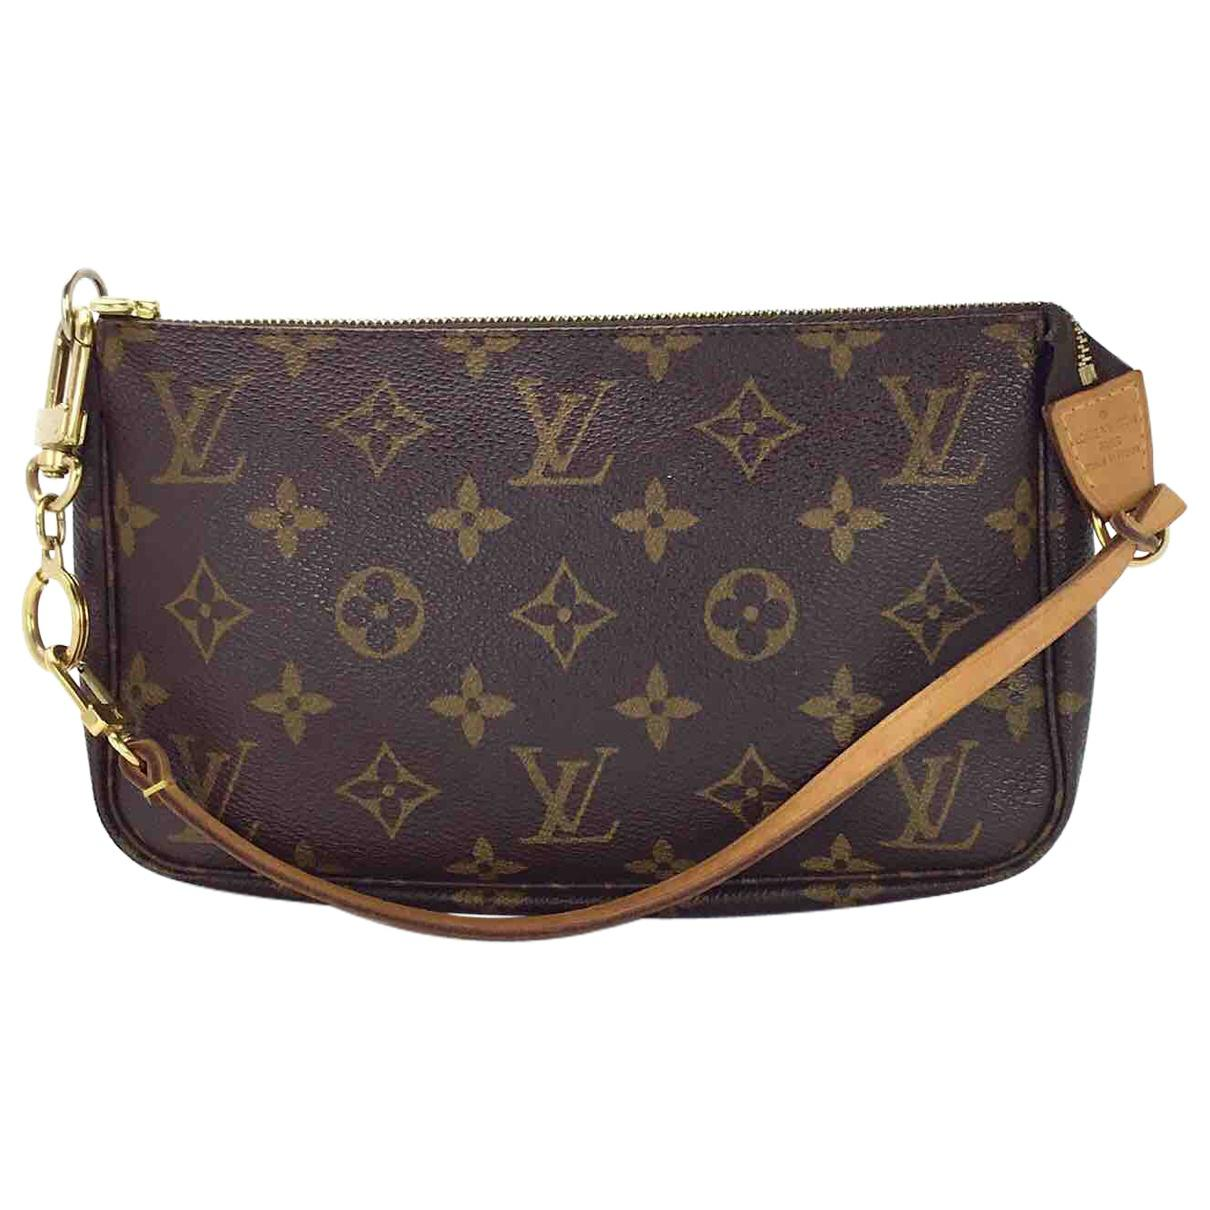 Pre-owned - Pochette clutch bag Louis Vuitton 8LIPi2vXxZ